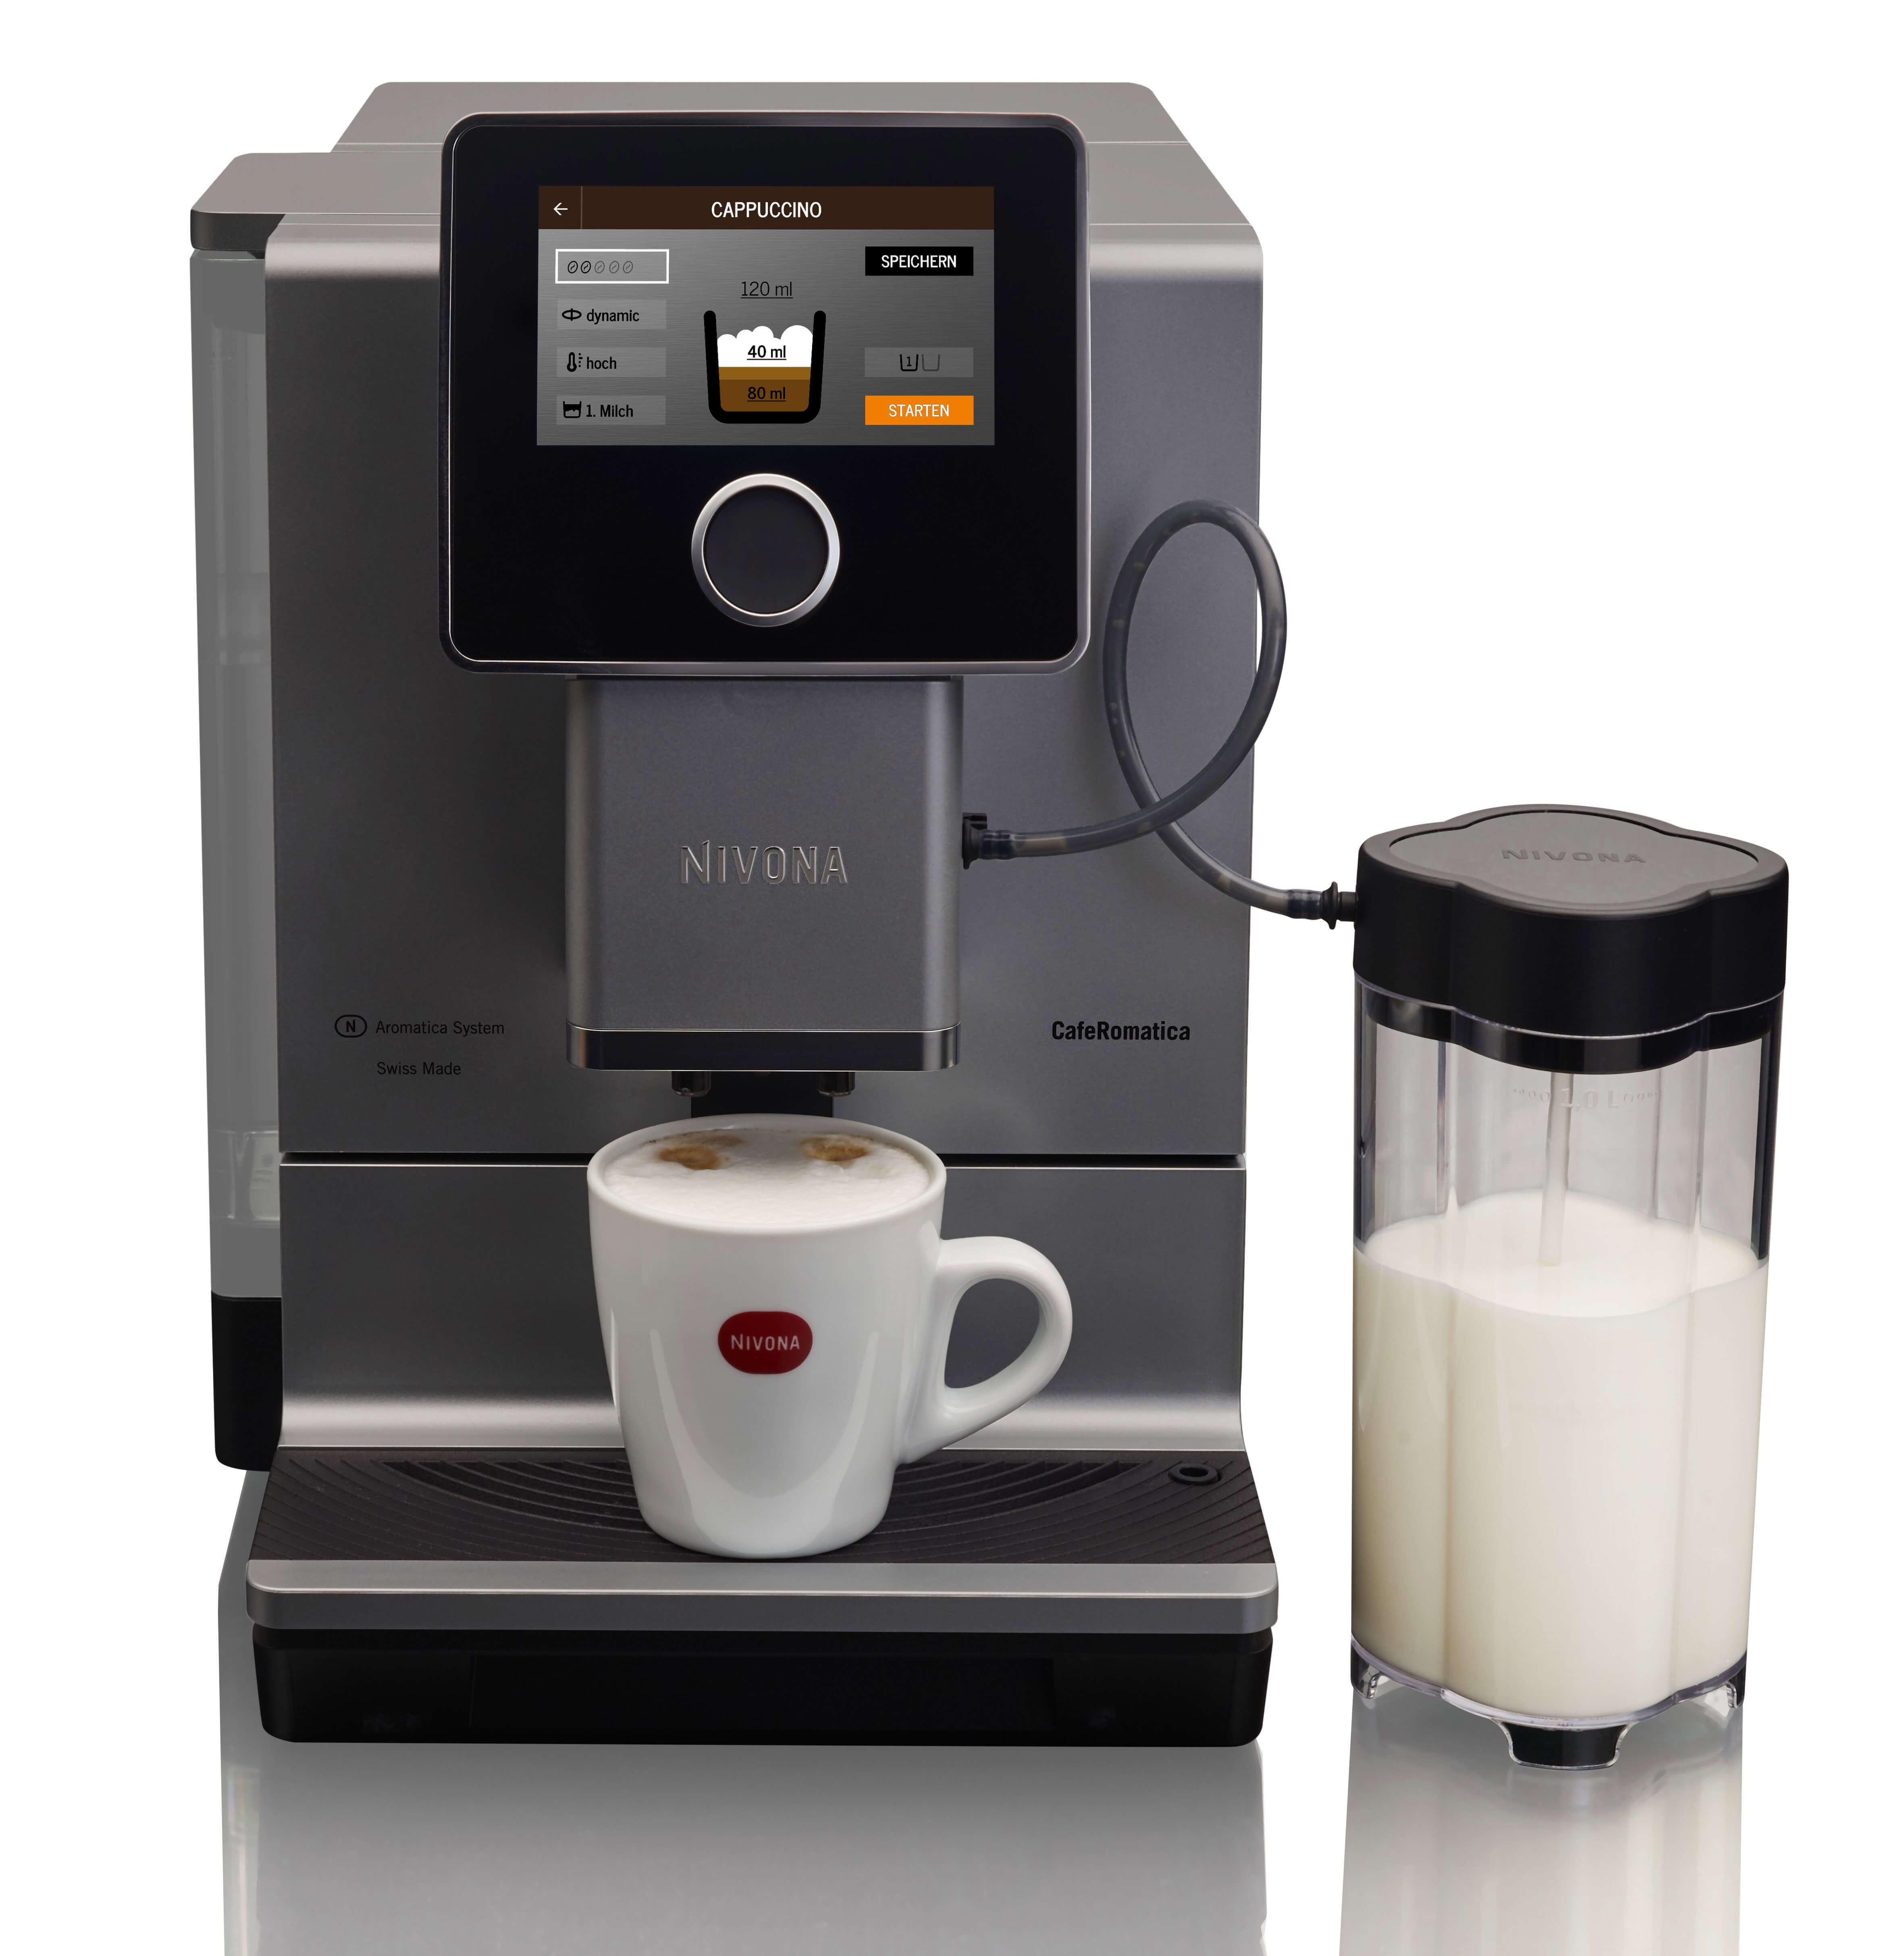 Nivona Kaffeevollautomat Cafe Romantica NICR 970 | Kamasega